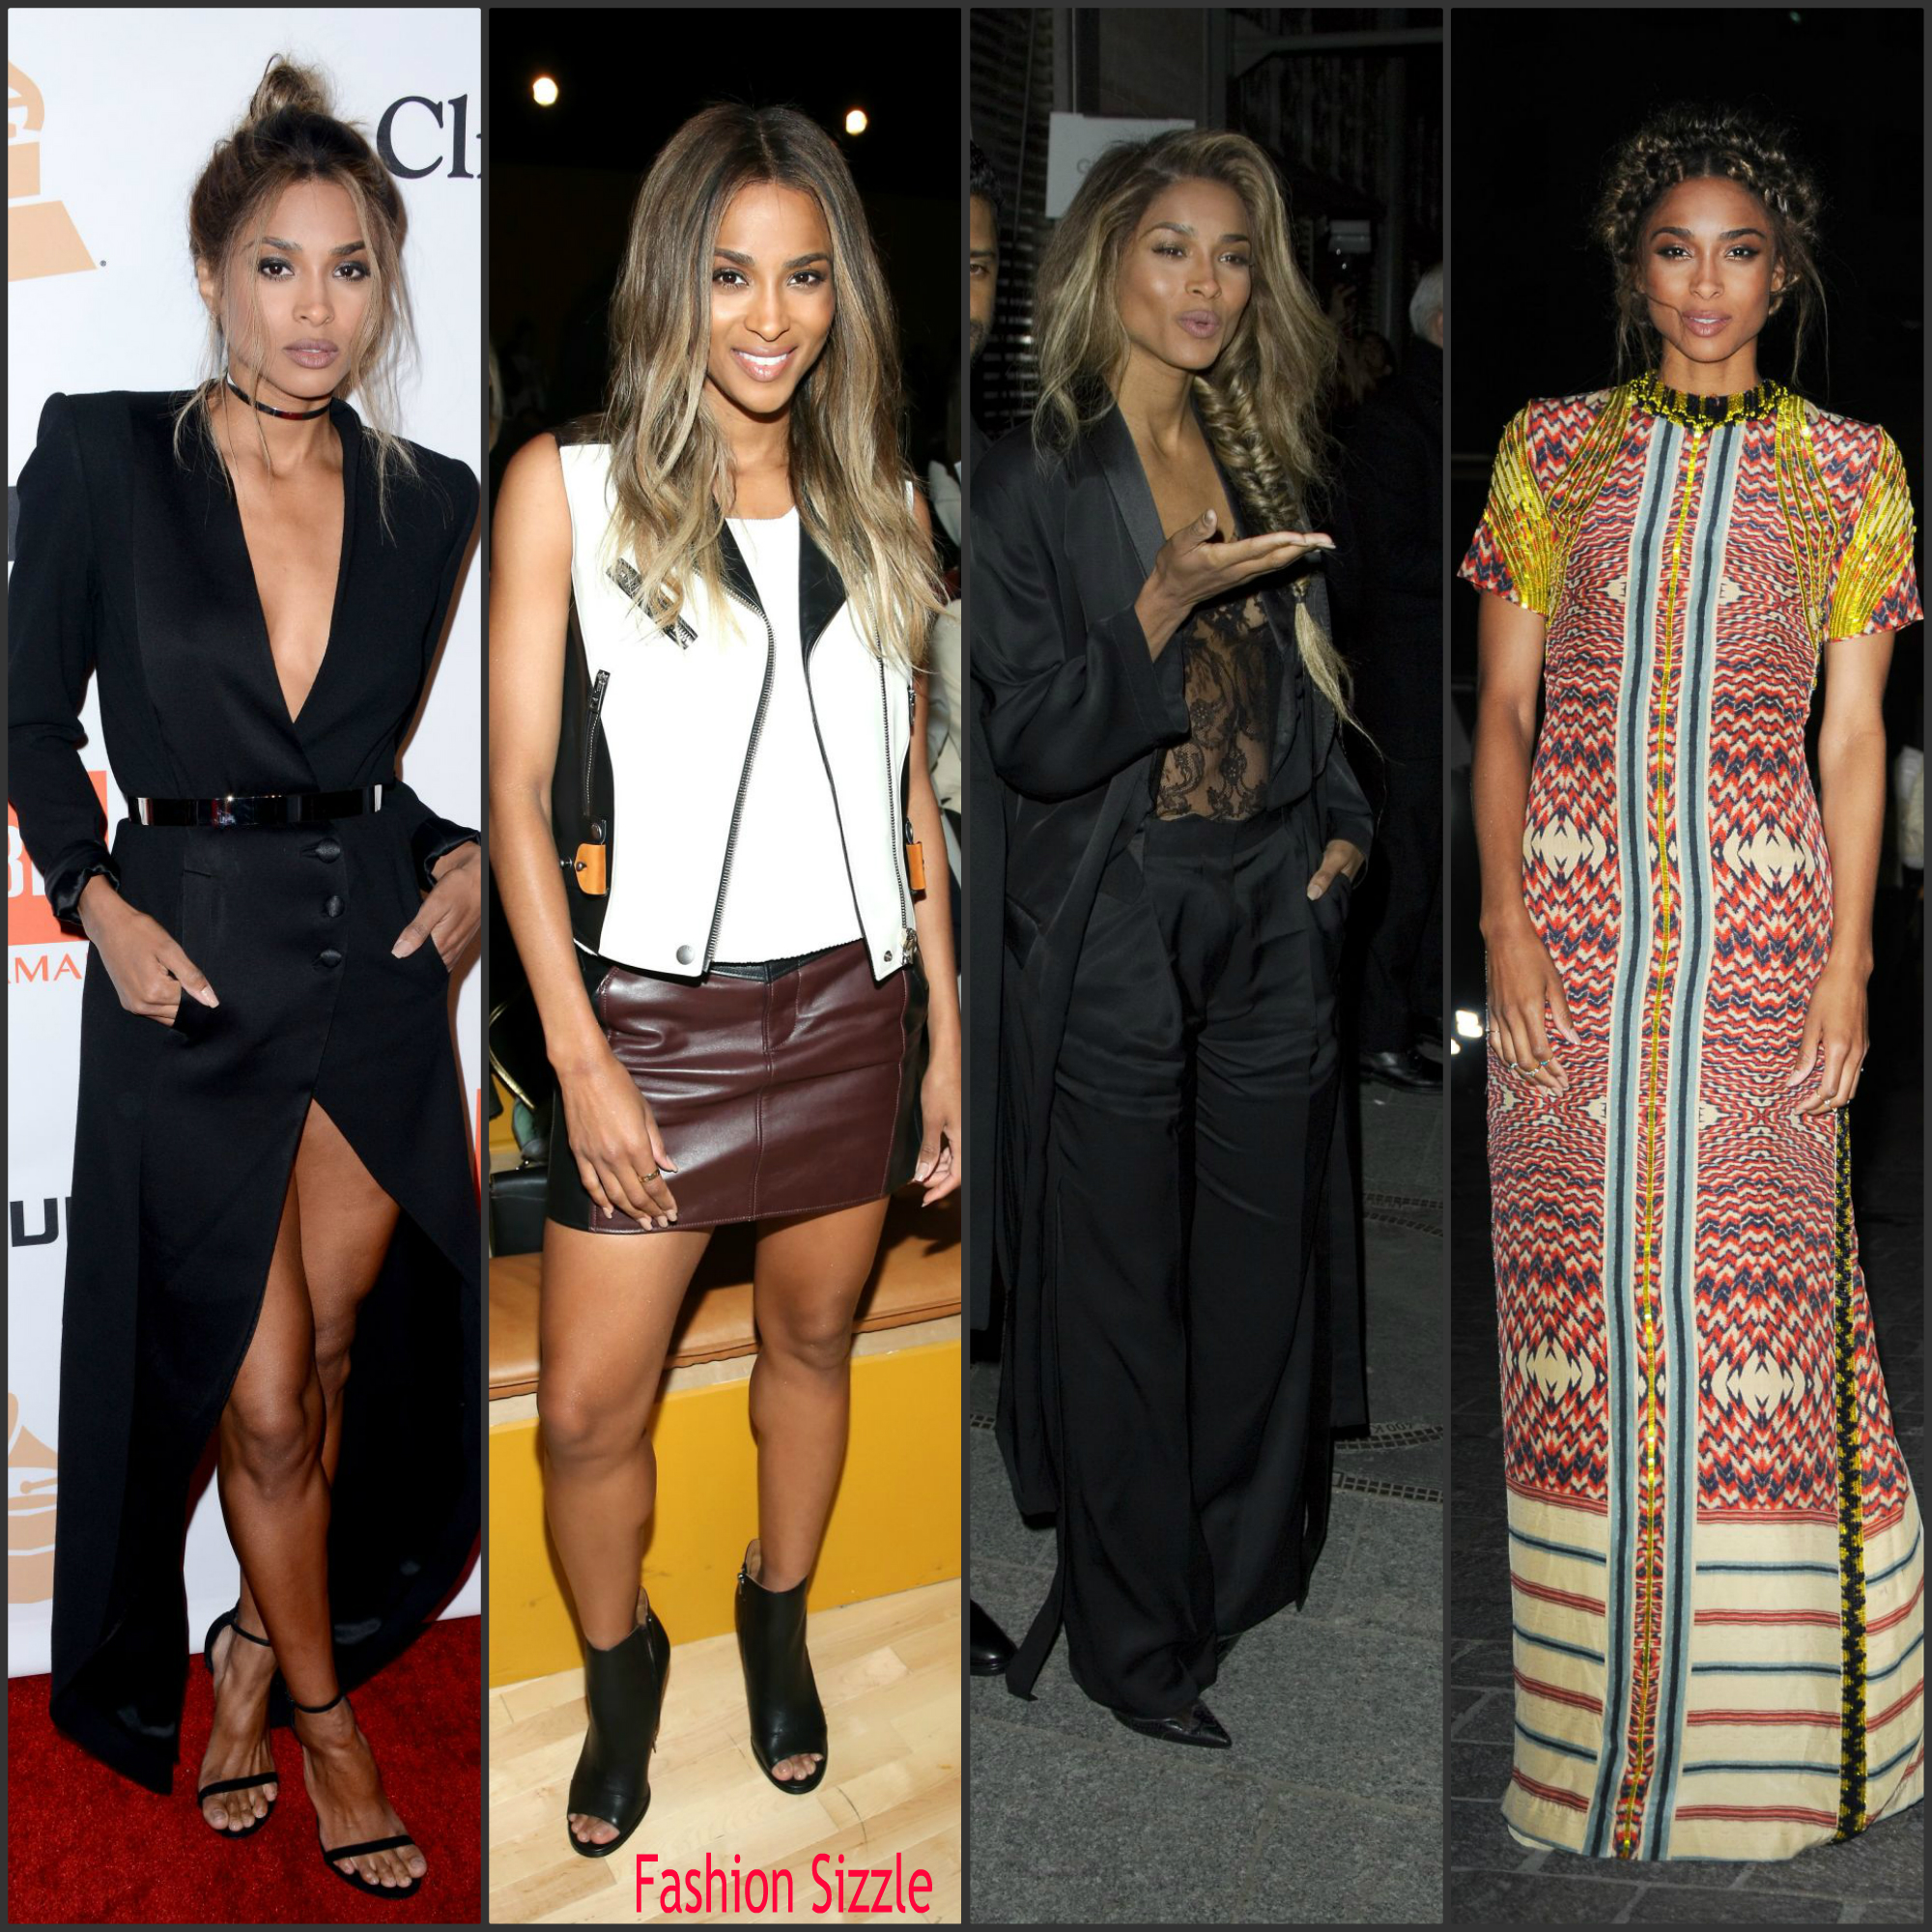 ciara-fashionstyle